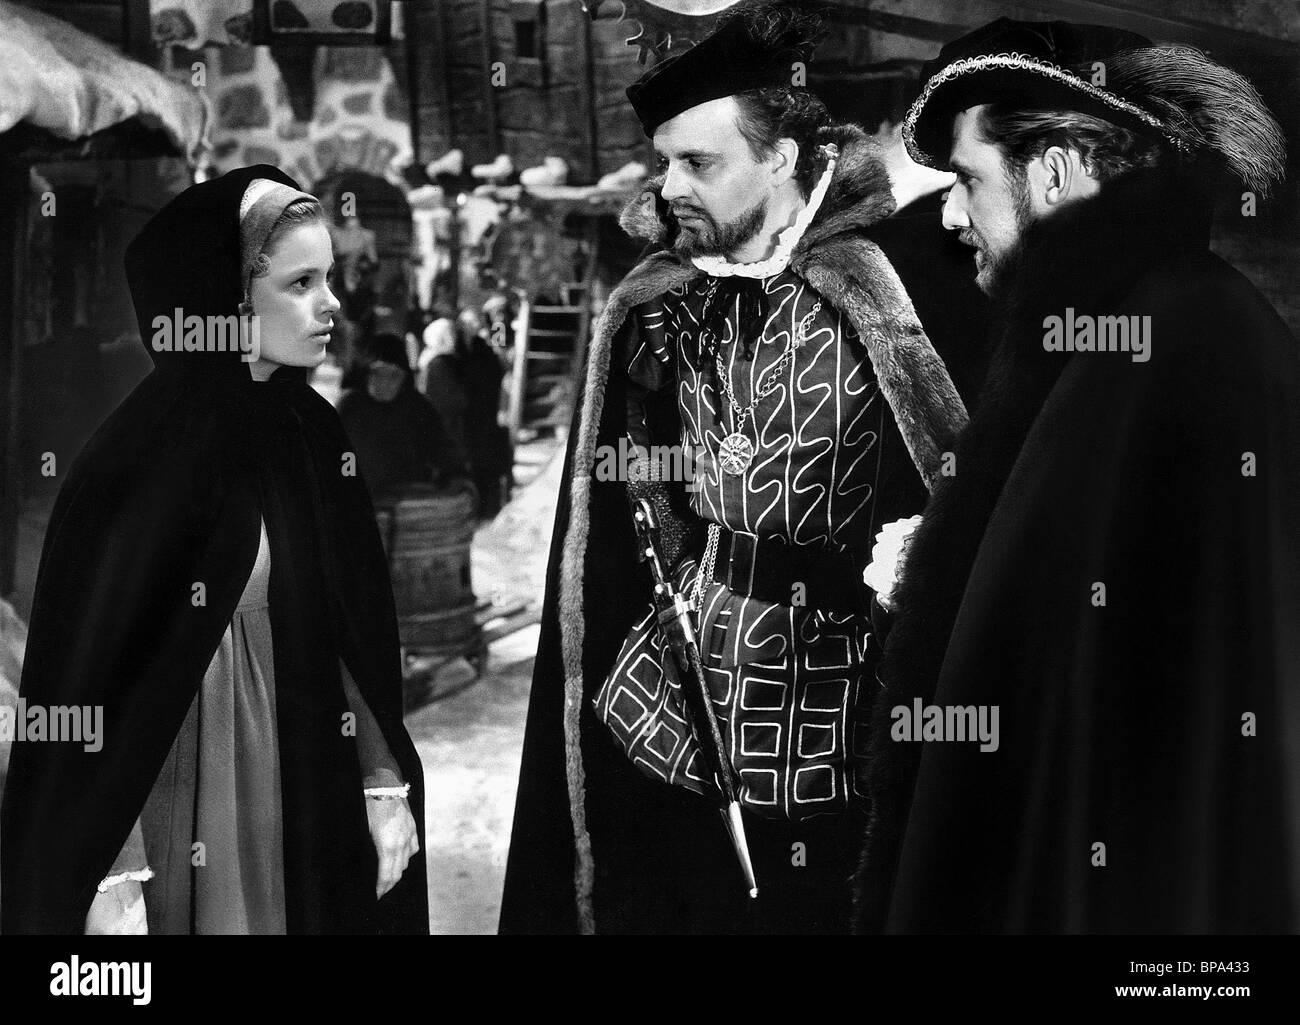 ULLA JACOBSSON SIR ARNE'S TREASURE (1954) - Stock Image